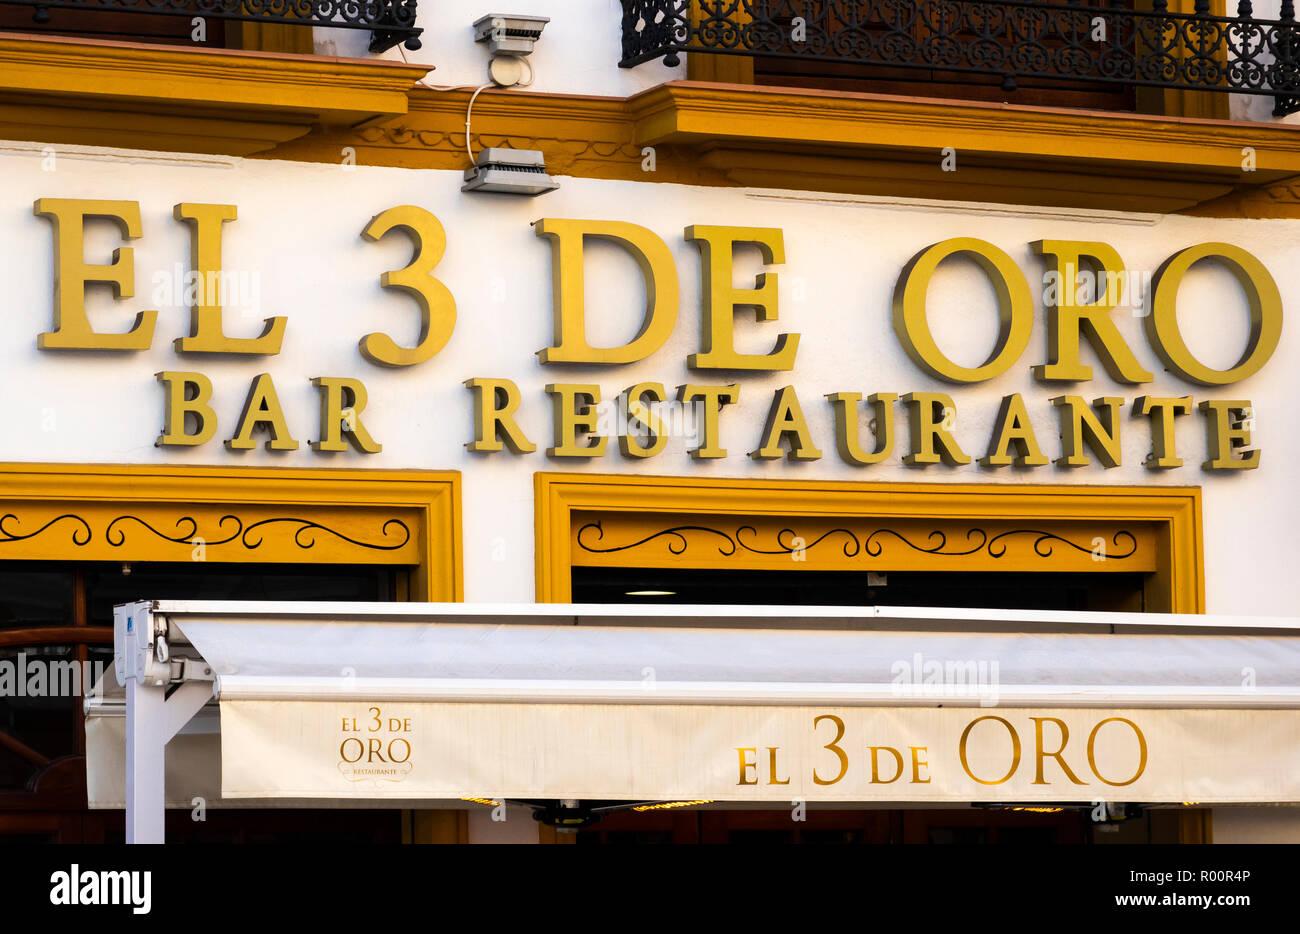 the-el-3-de-oro-restaurant-in-seville-sp